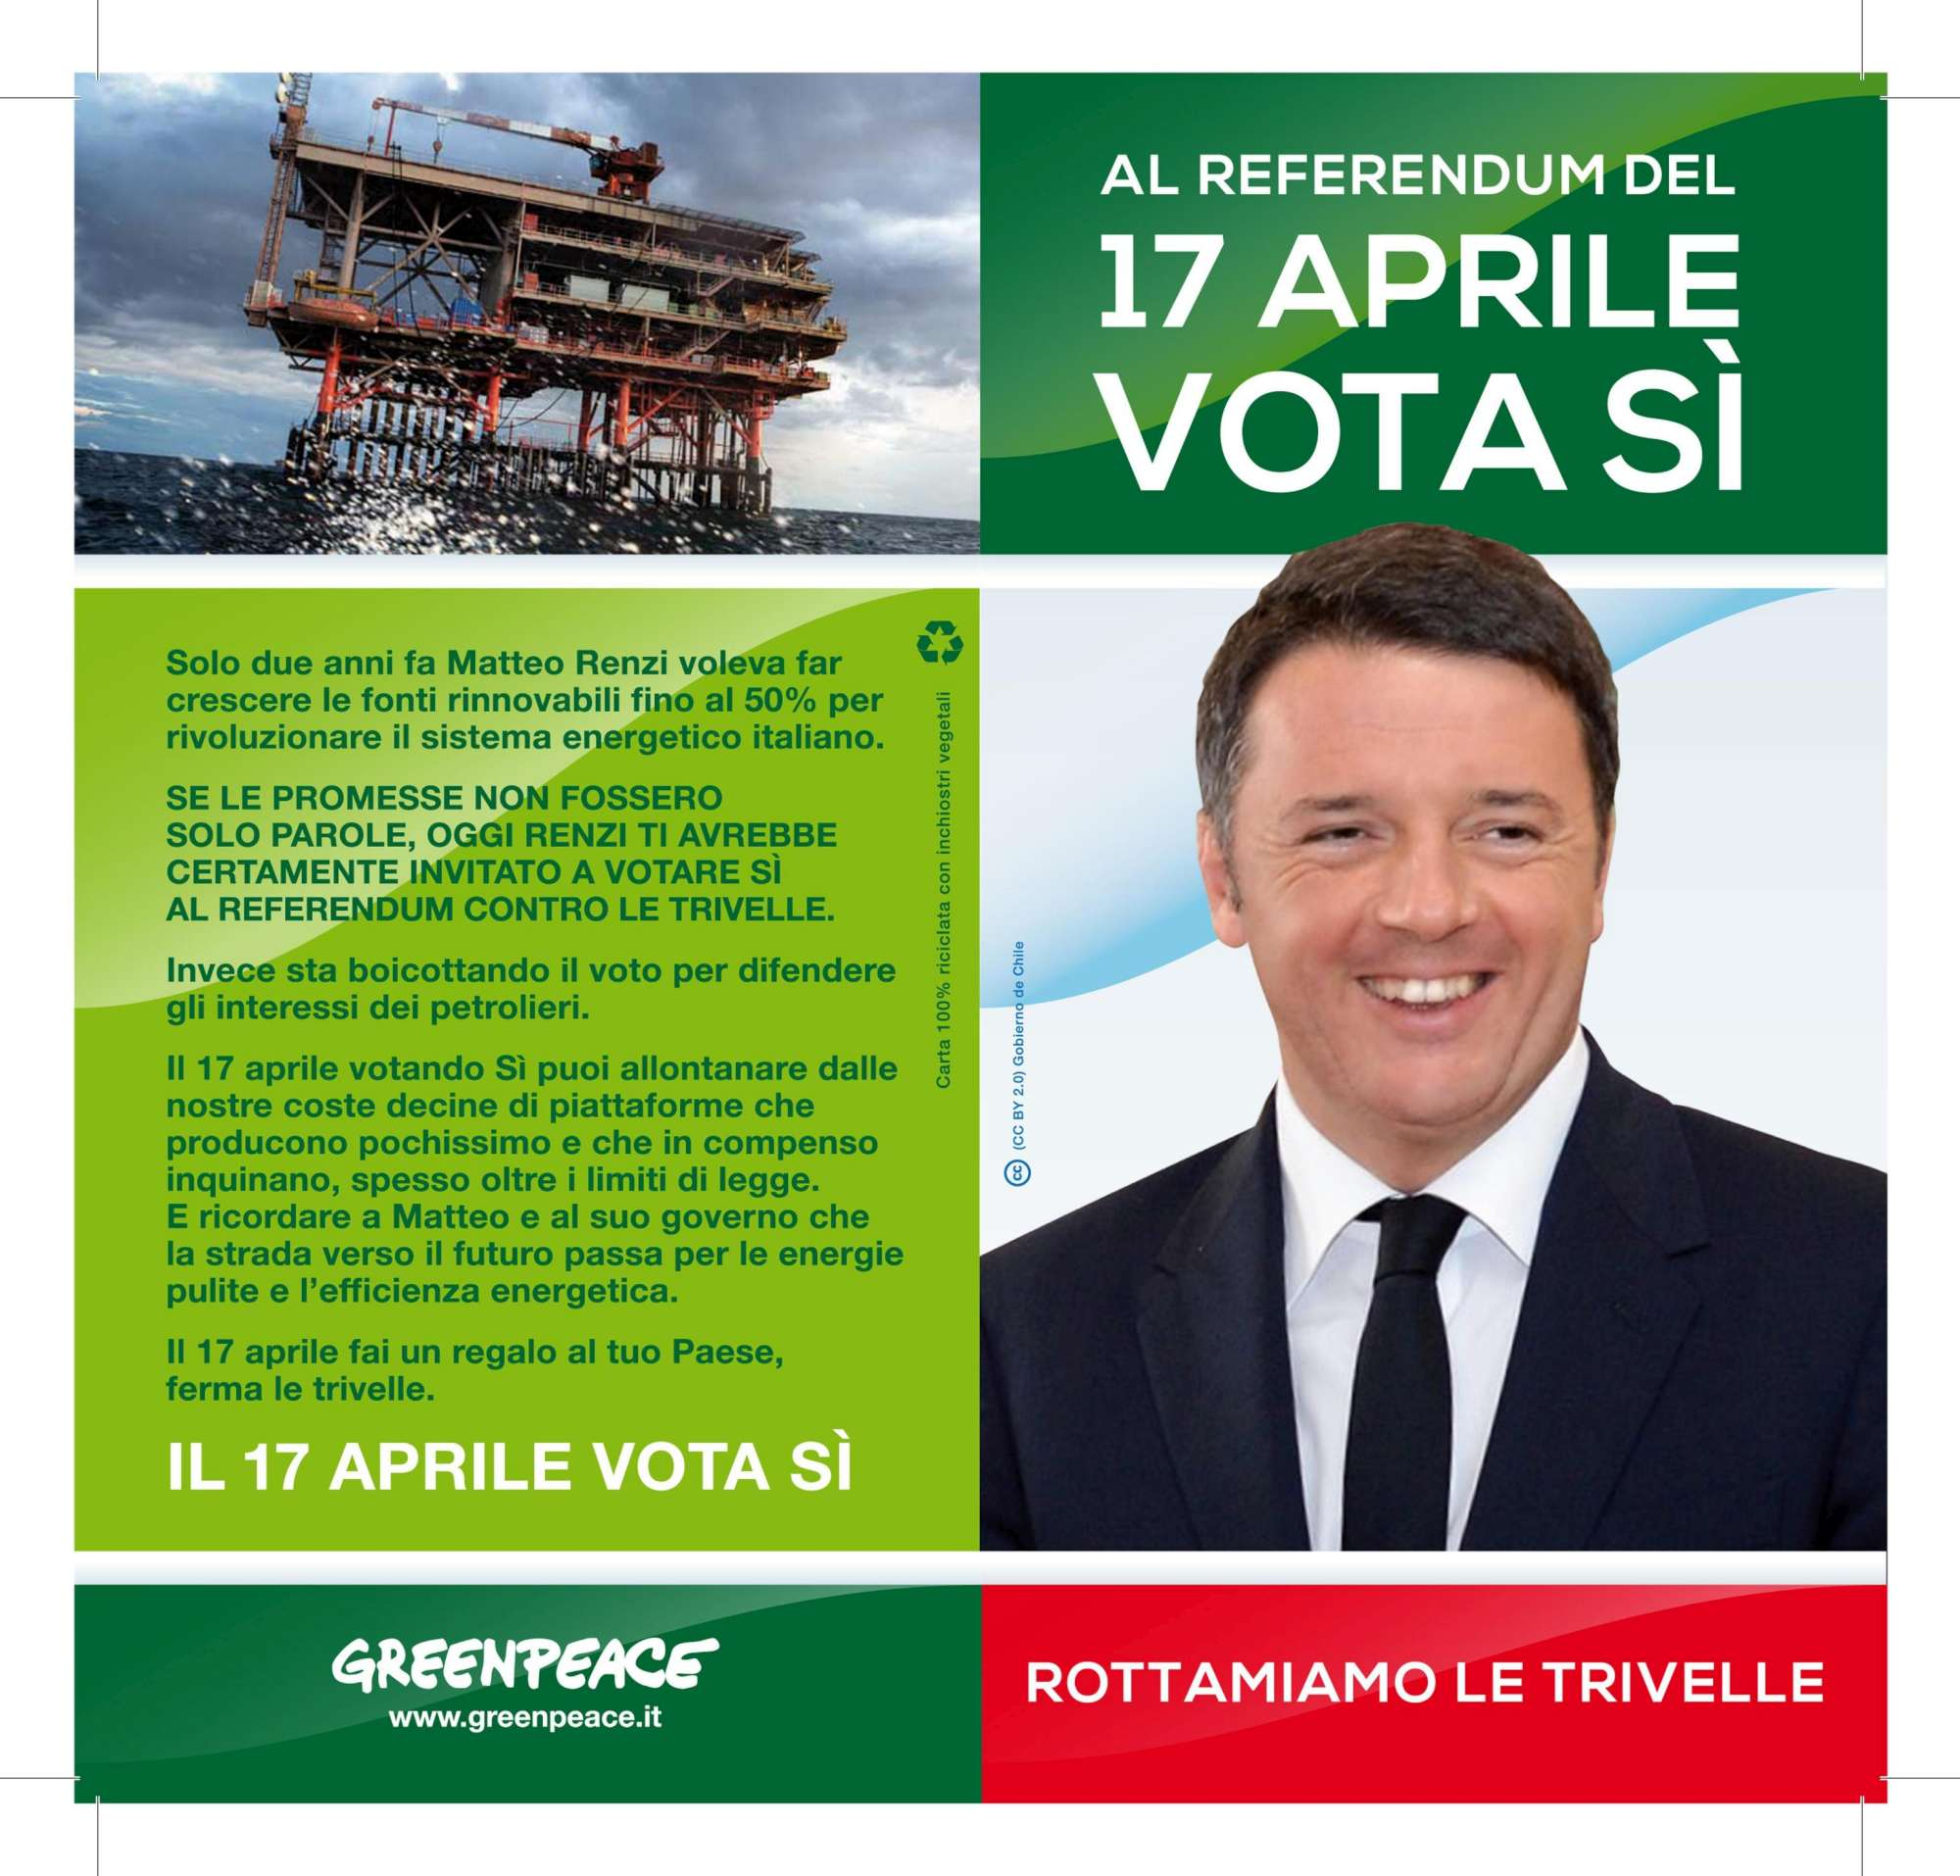 La provocazione di Greenpeace: Renzi vota sì al referendum